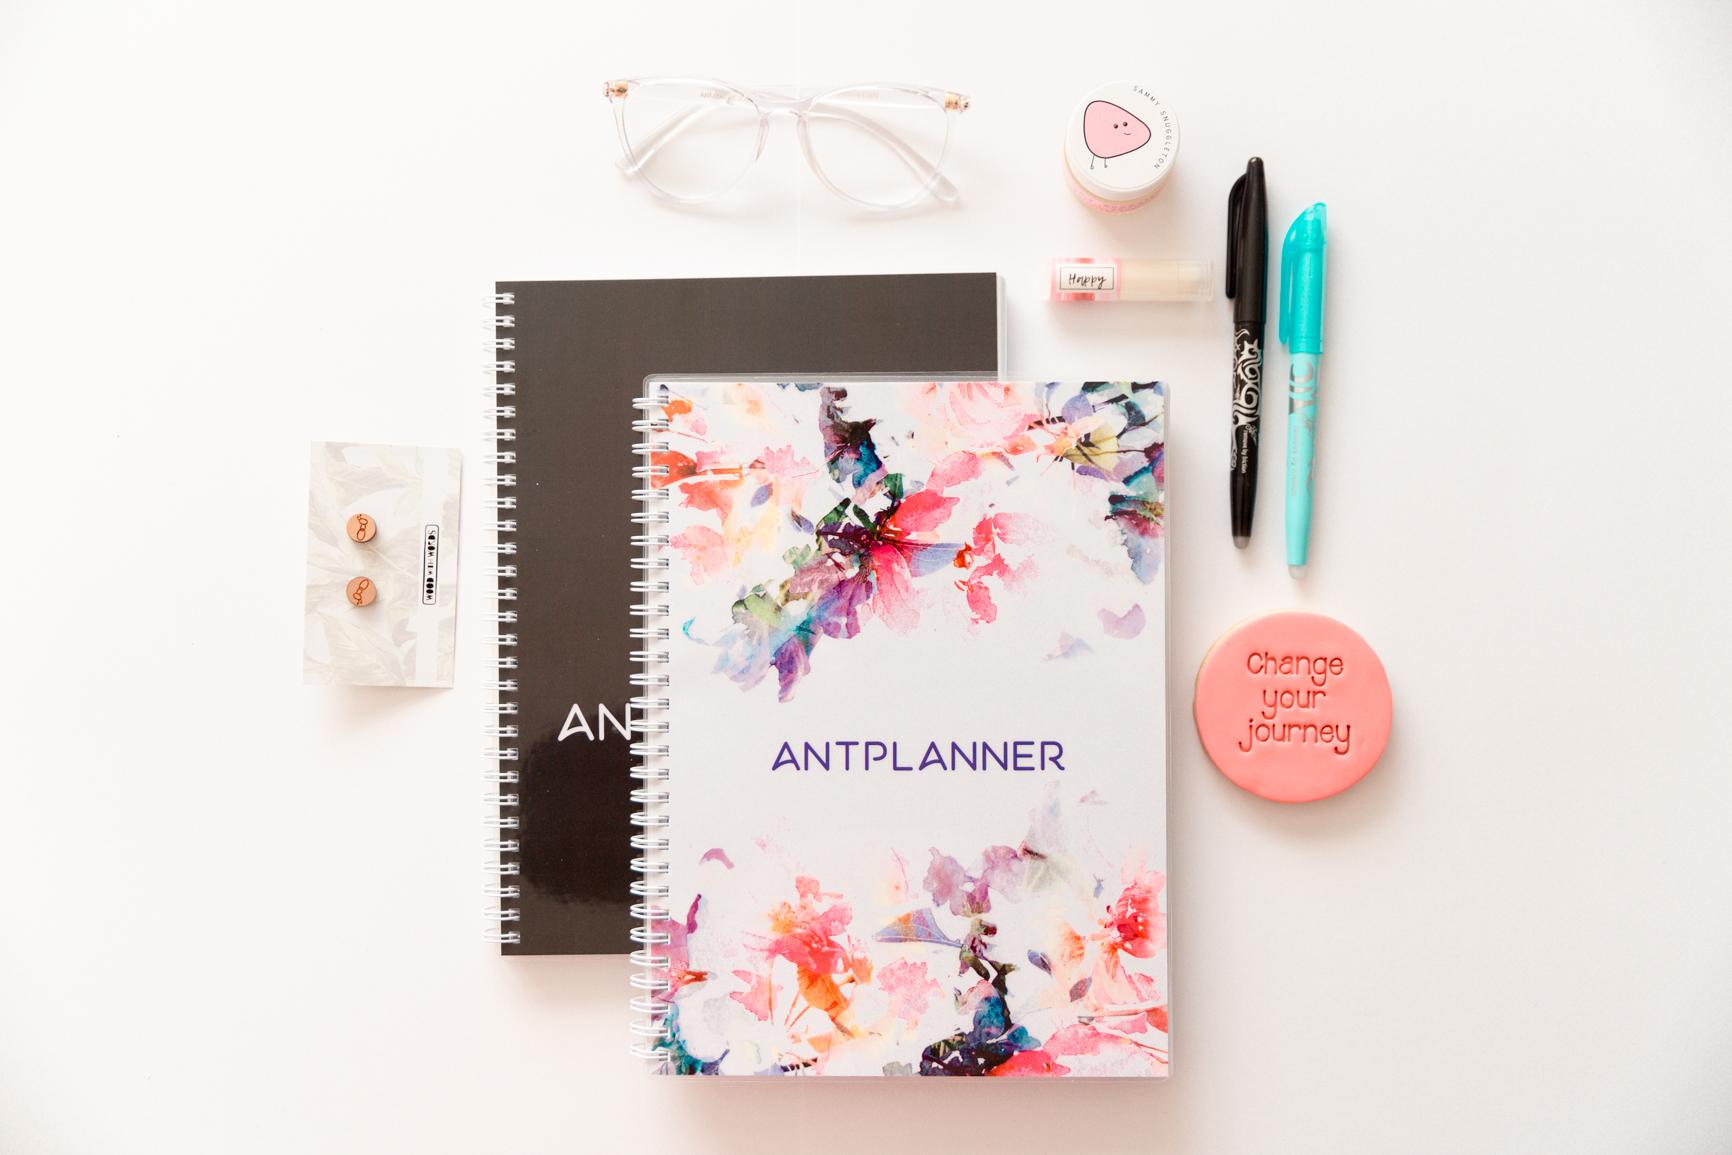 Antplanners